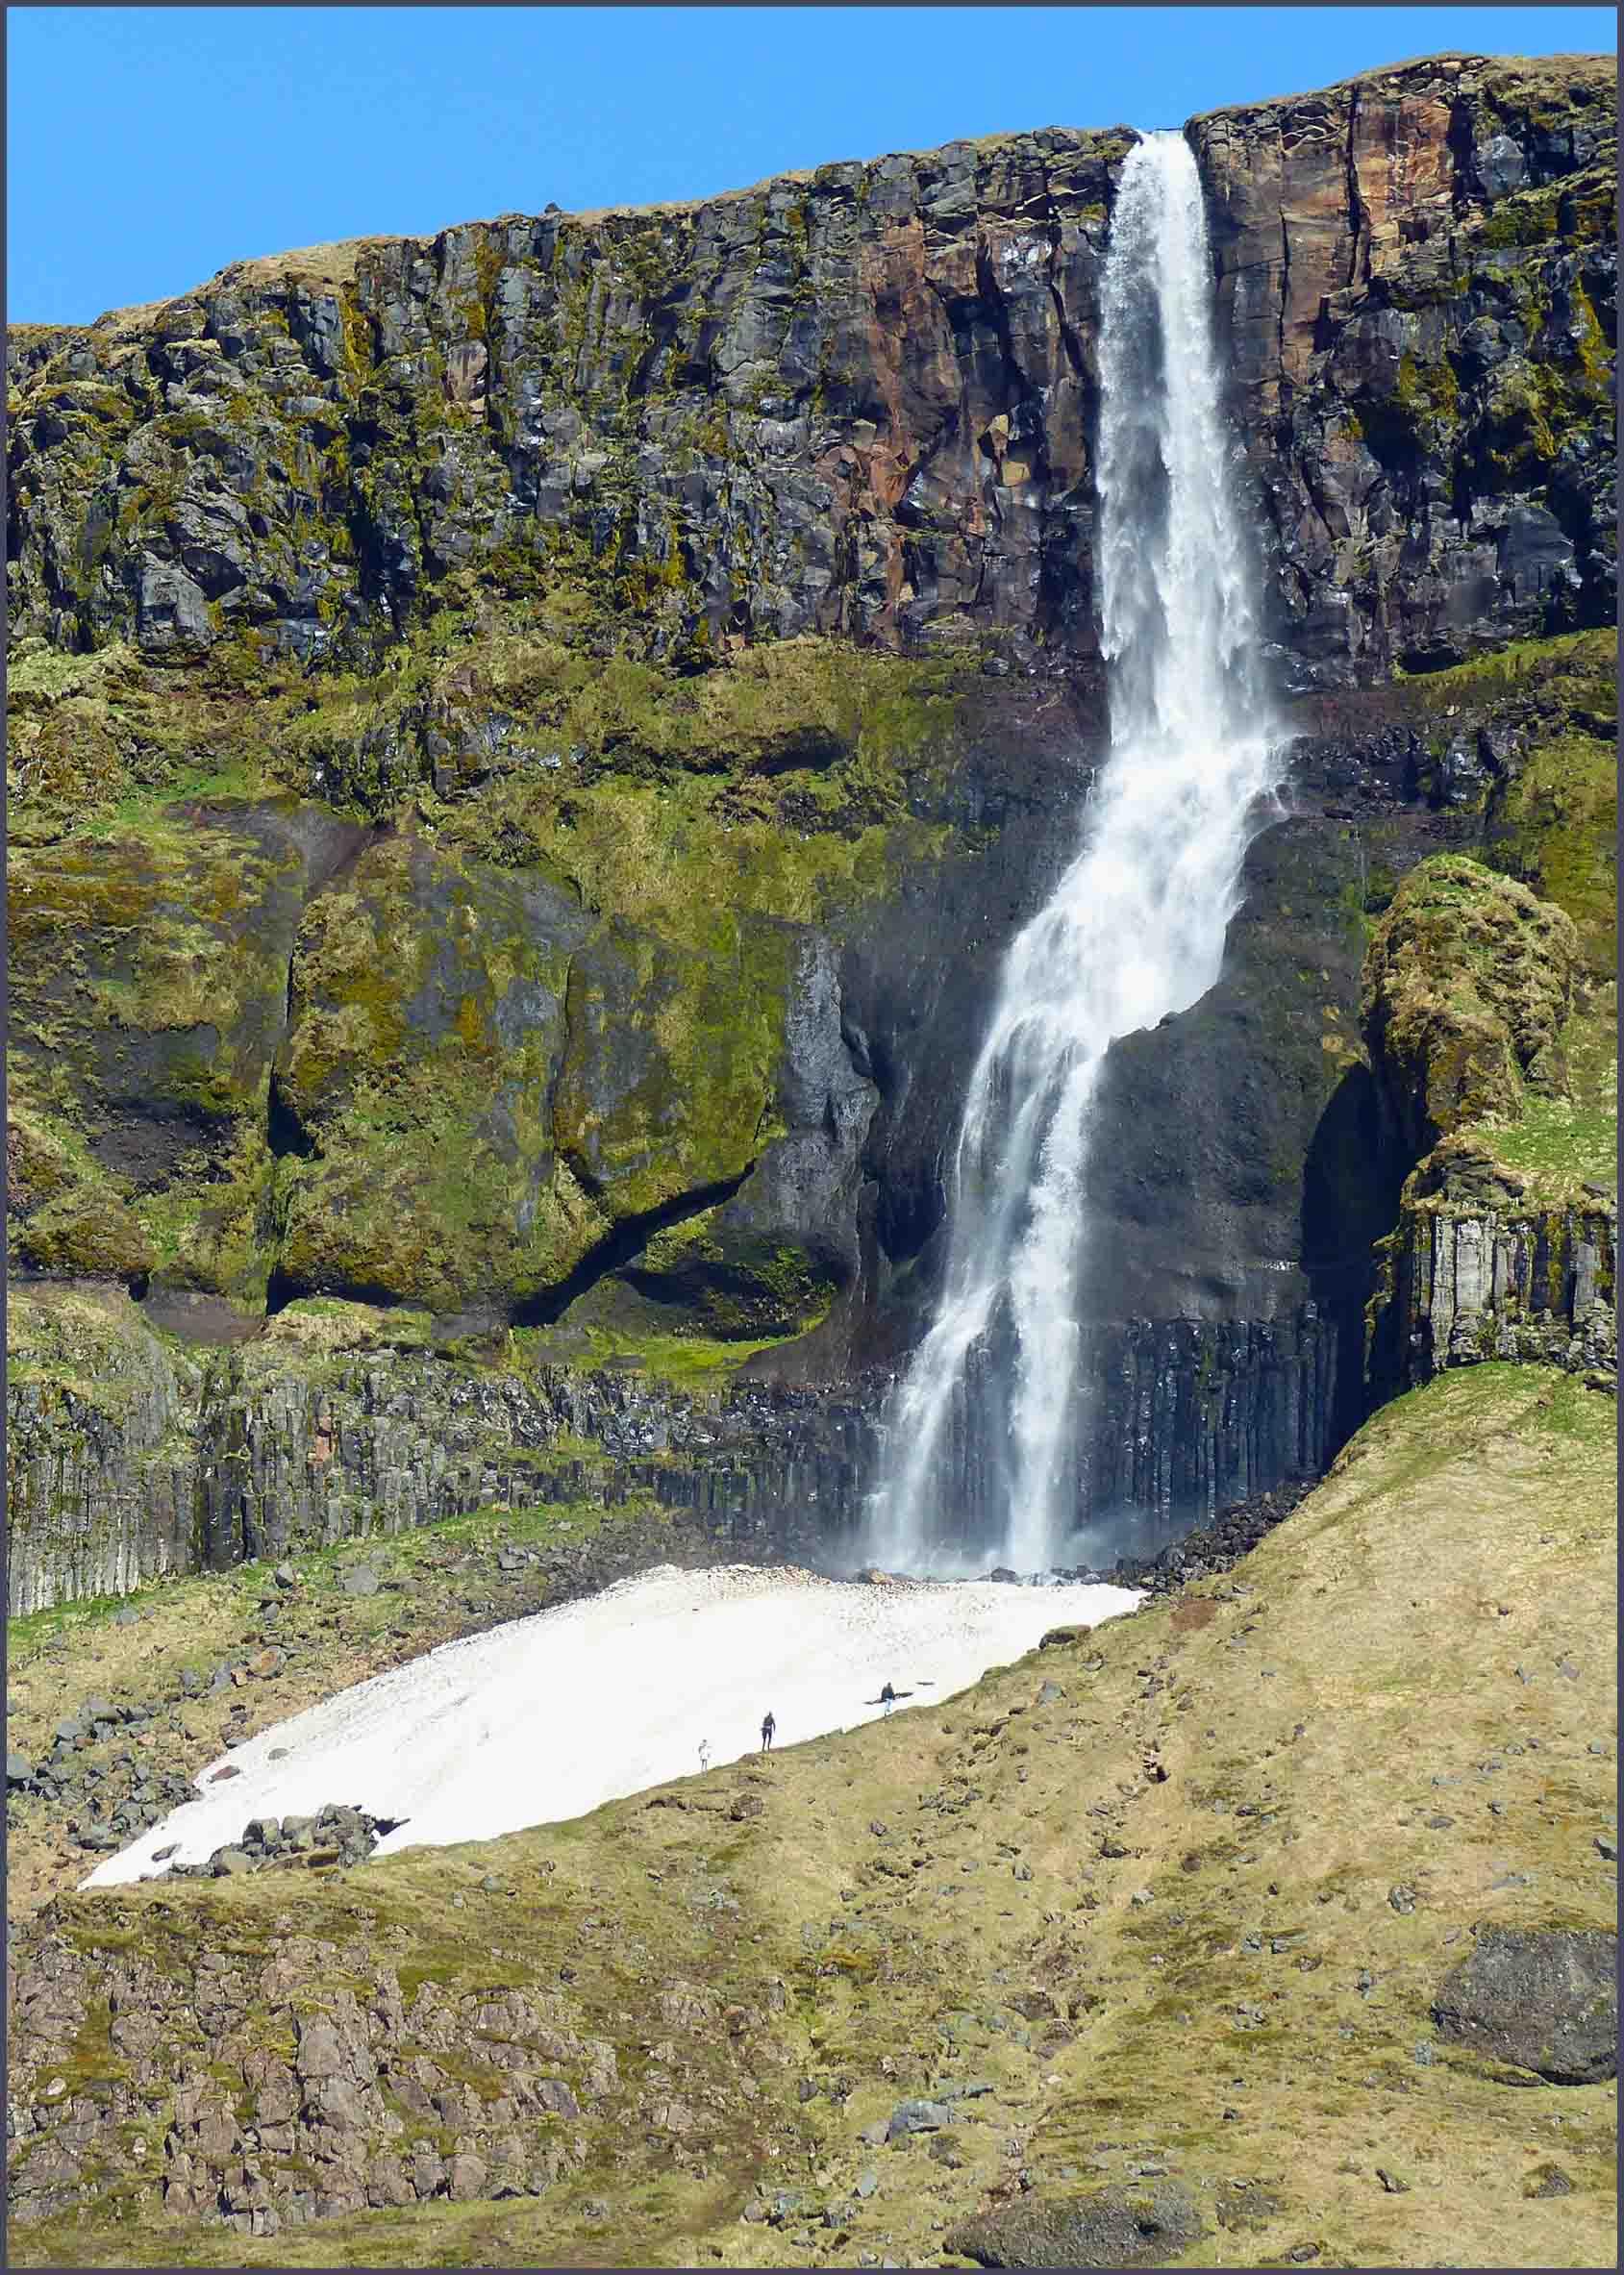 Veil-like waterfall and small glacier